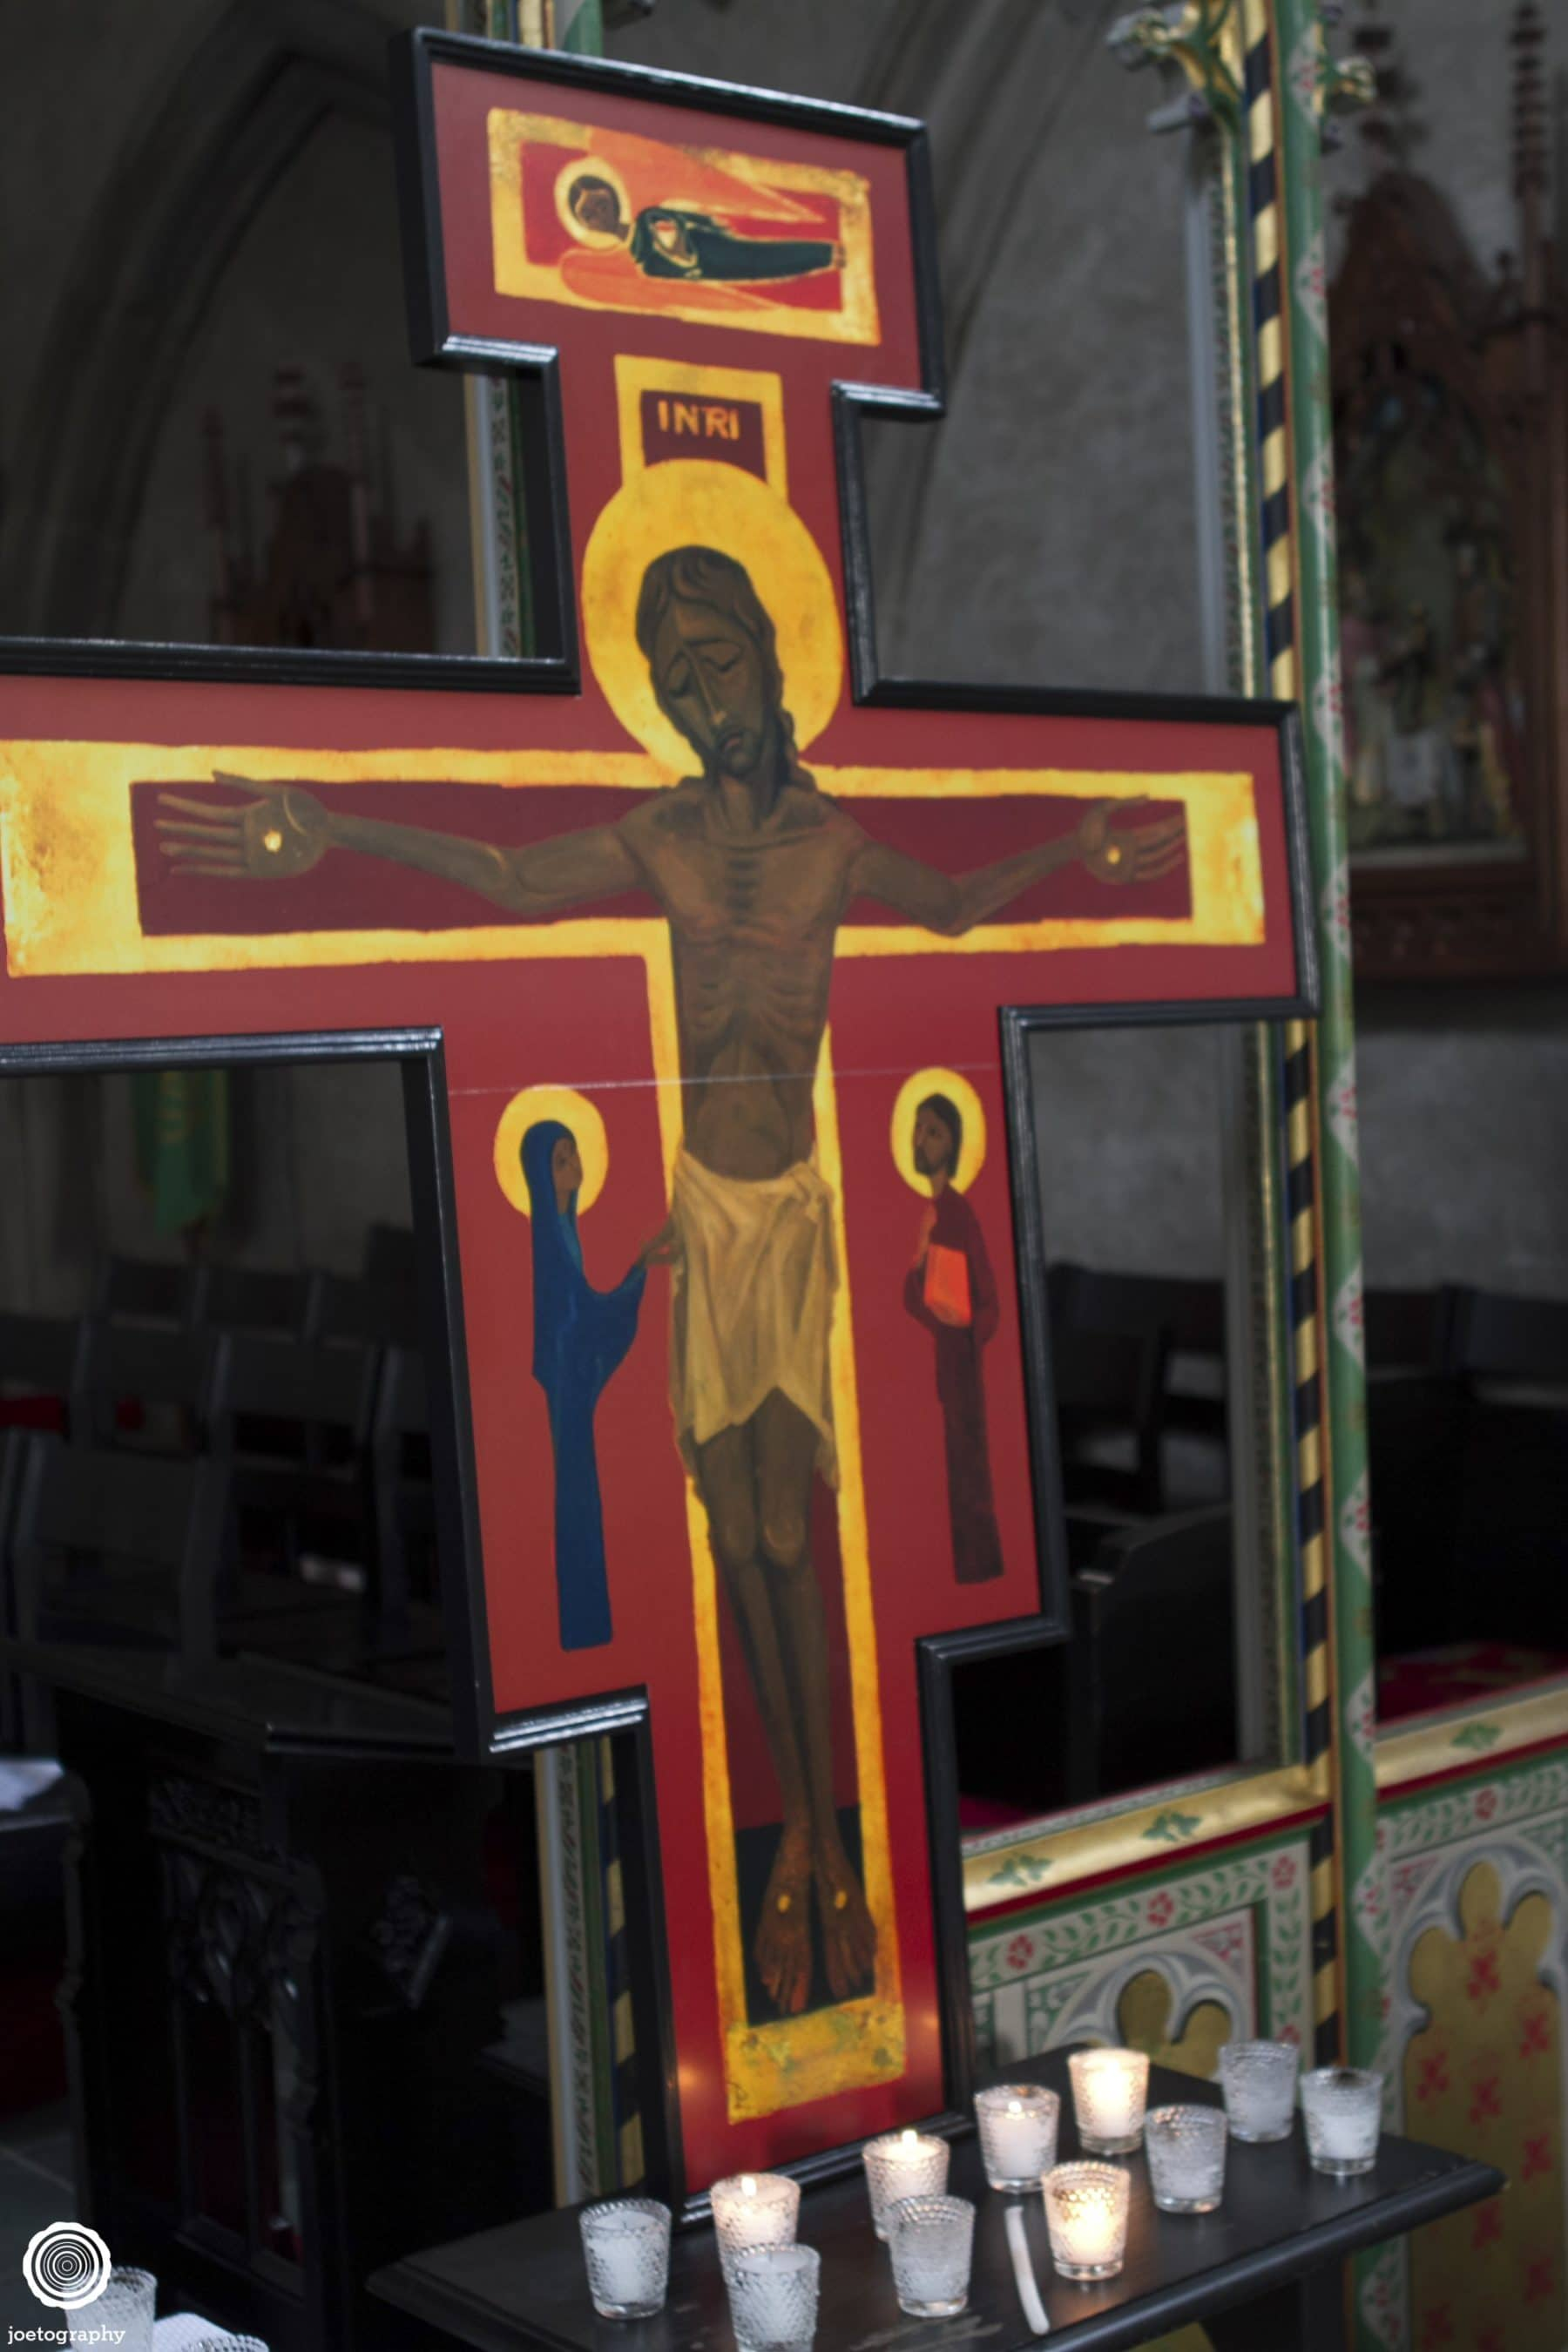 trinity-episcopal-church-indianapolis-159